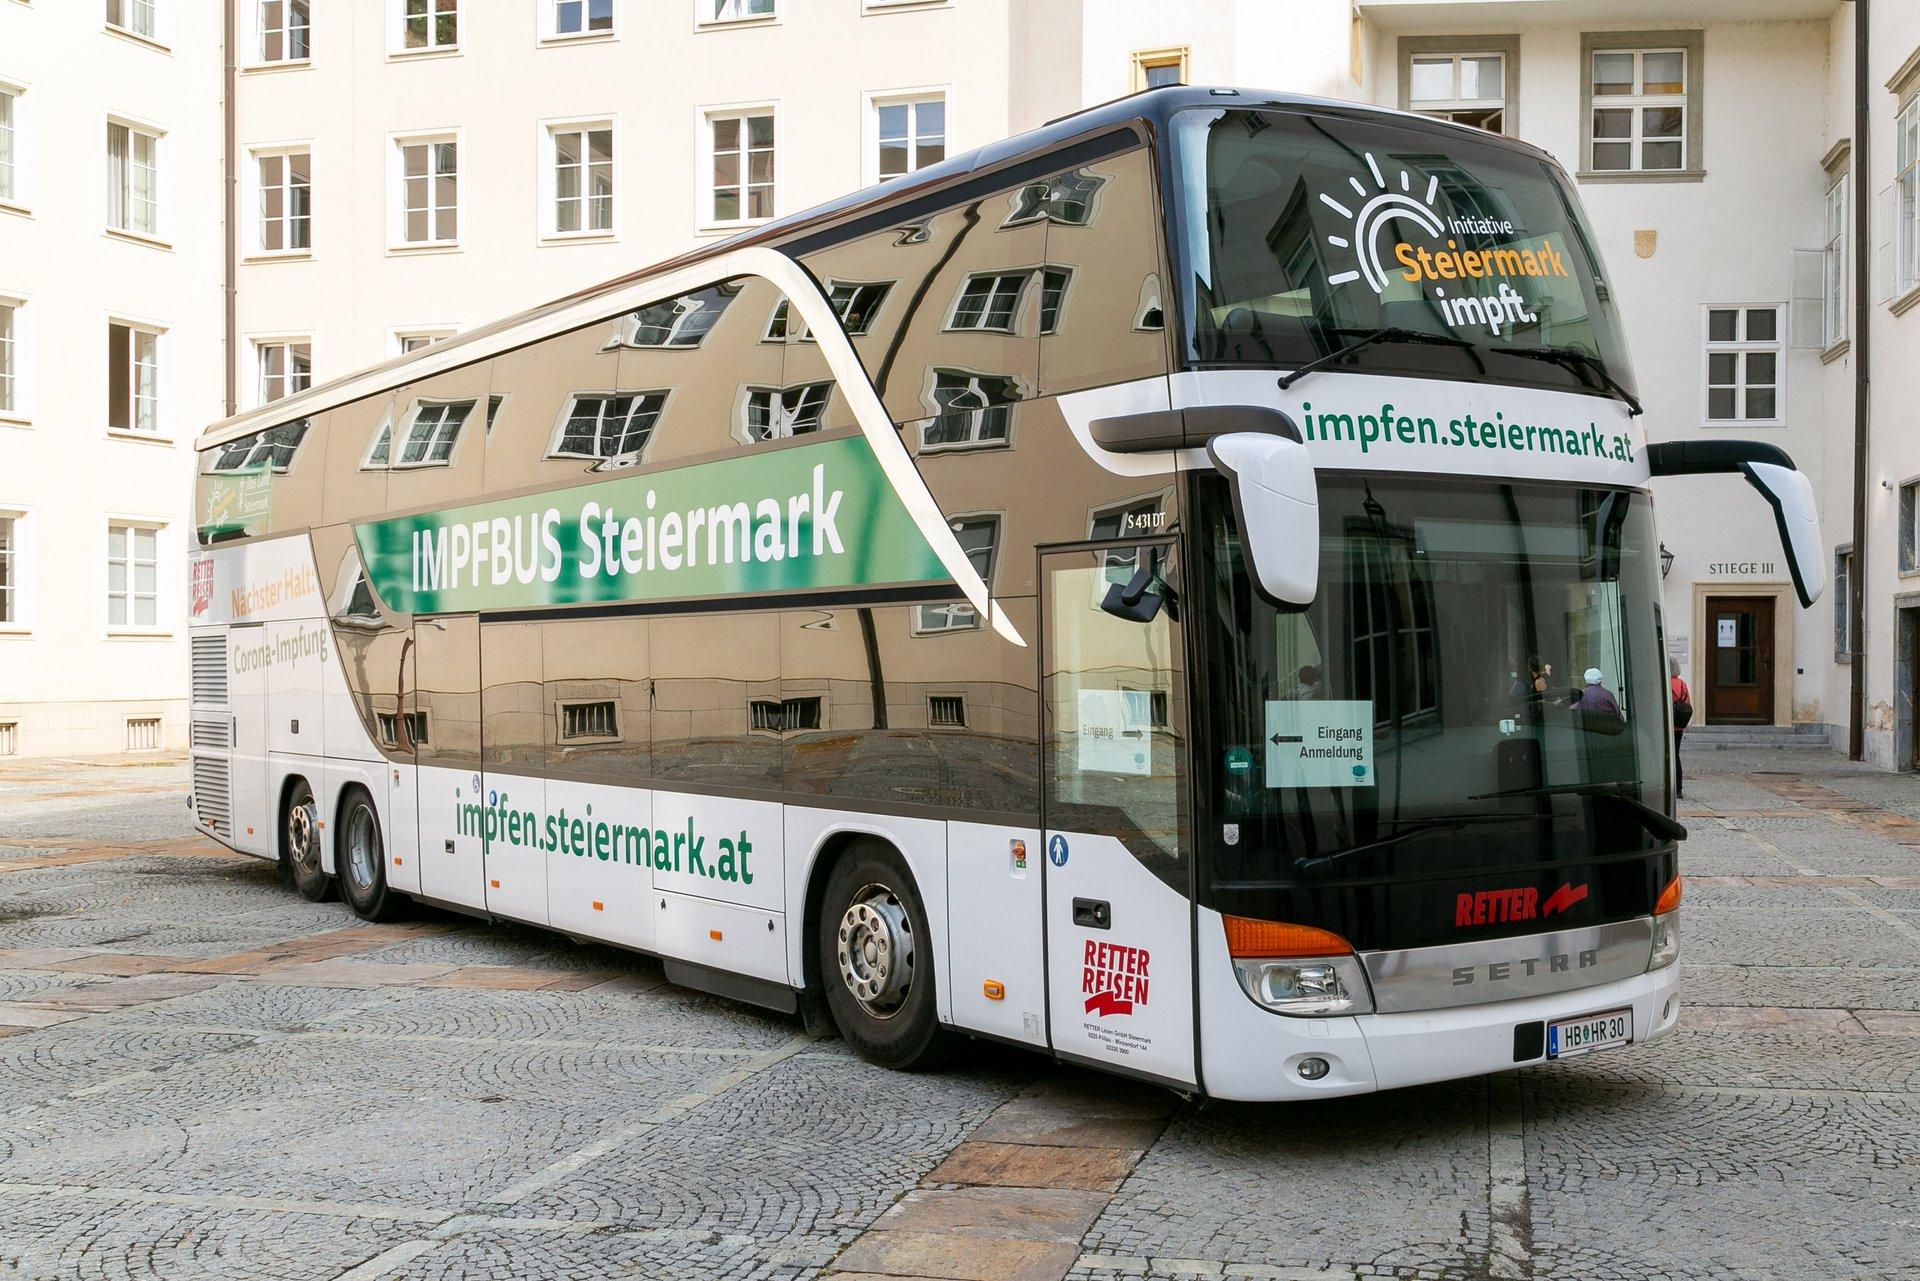 Impfbus Steiermark (© Land Steiermark)